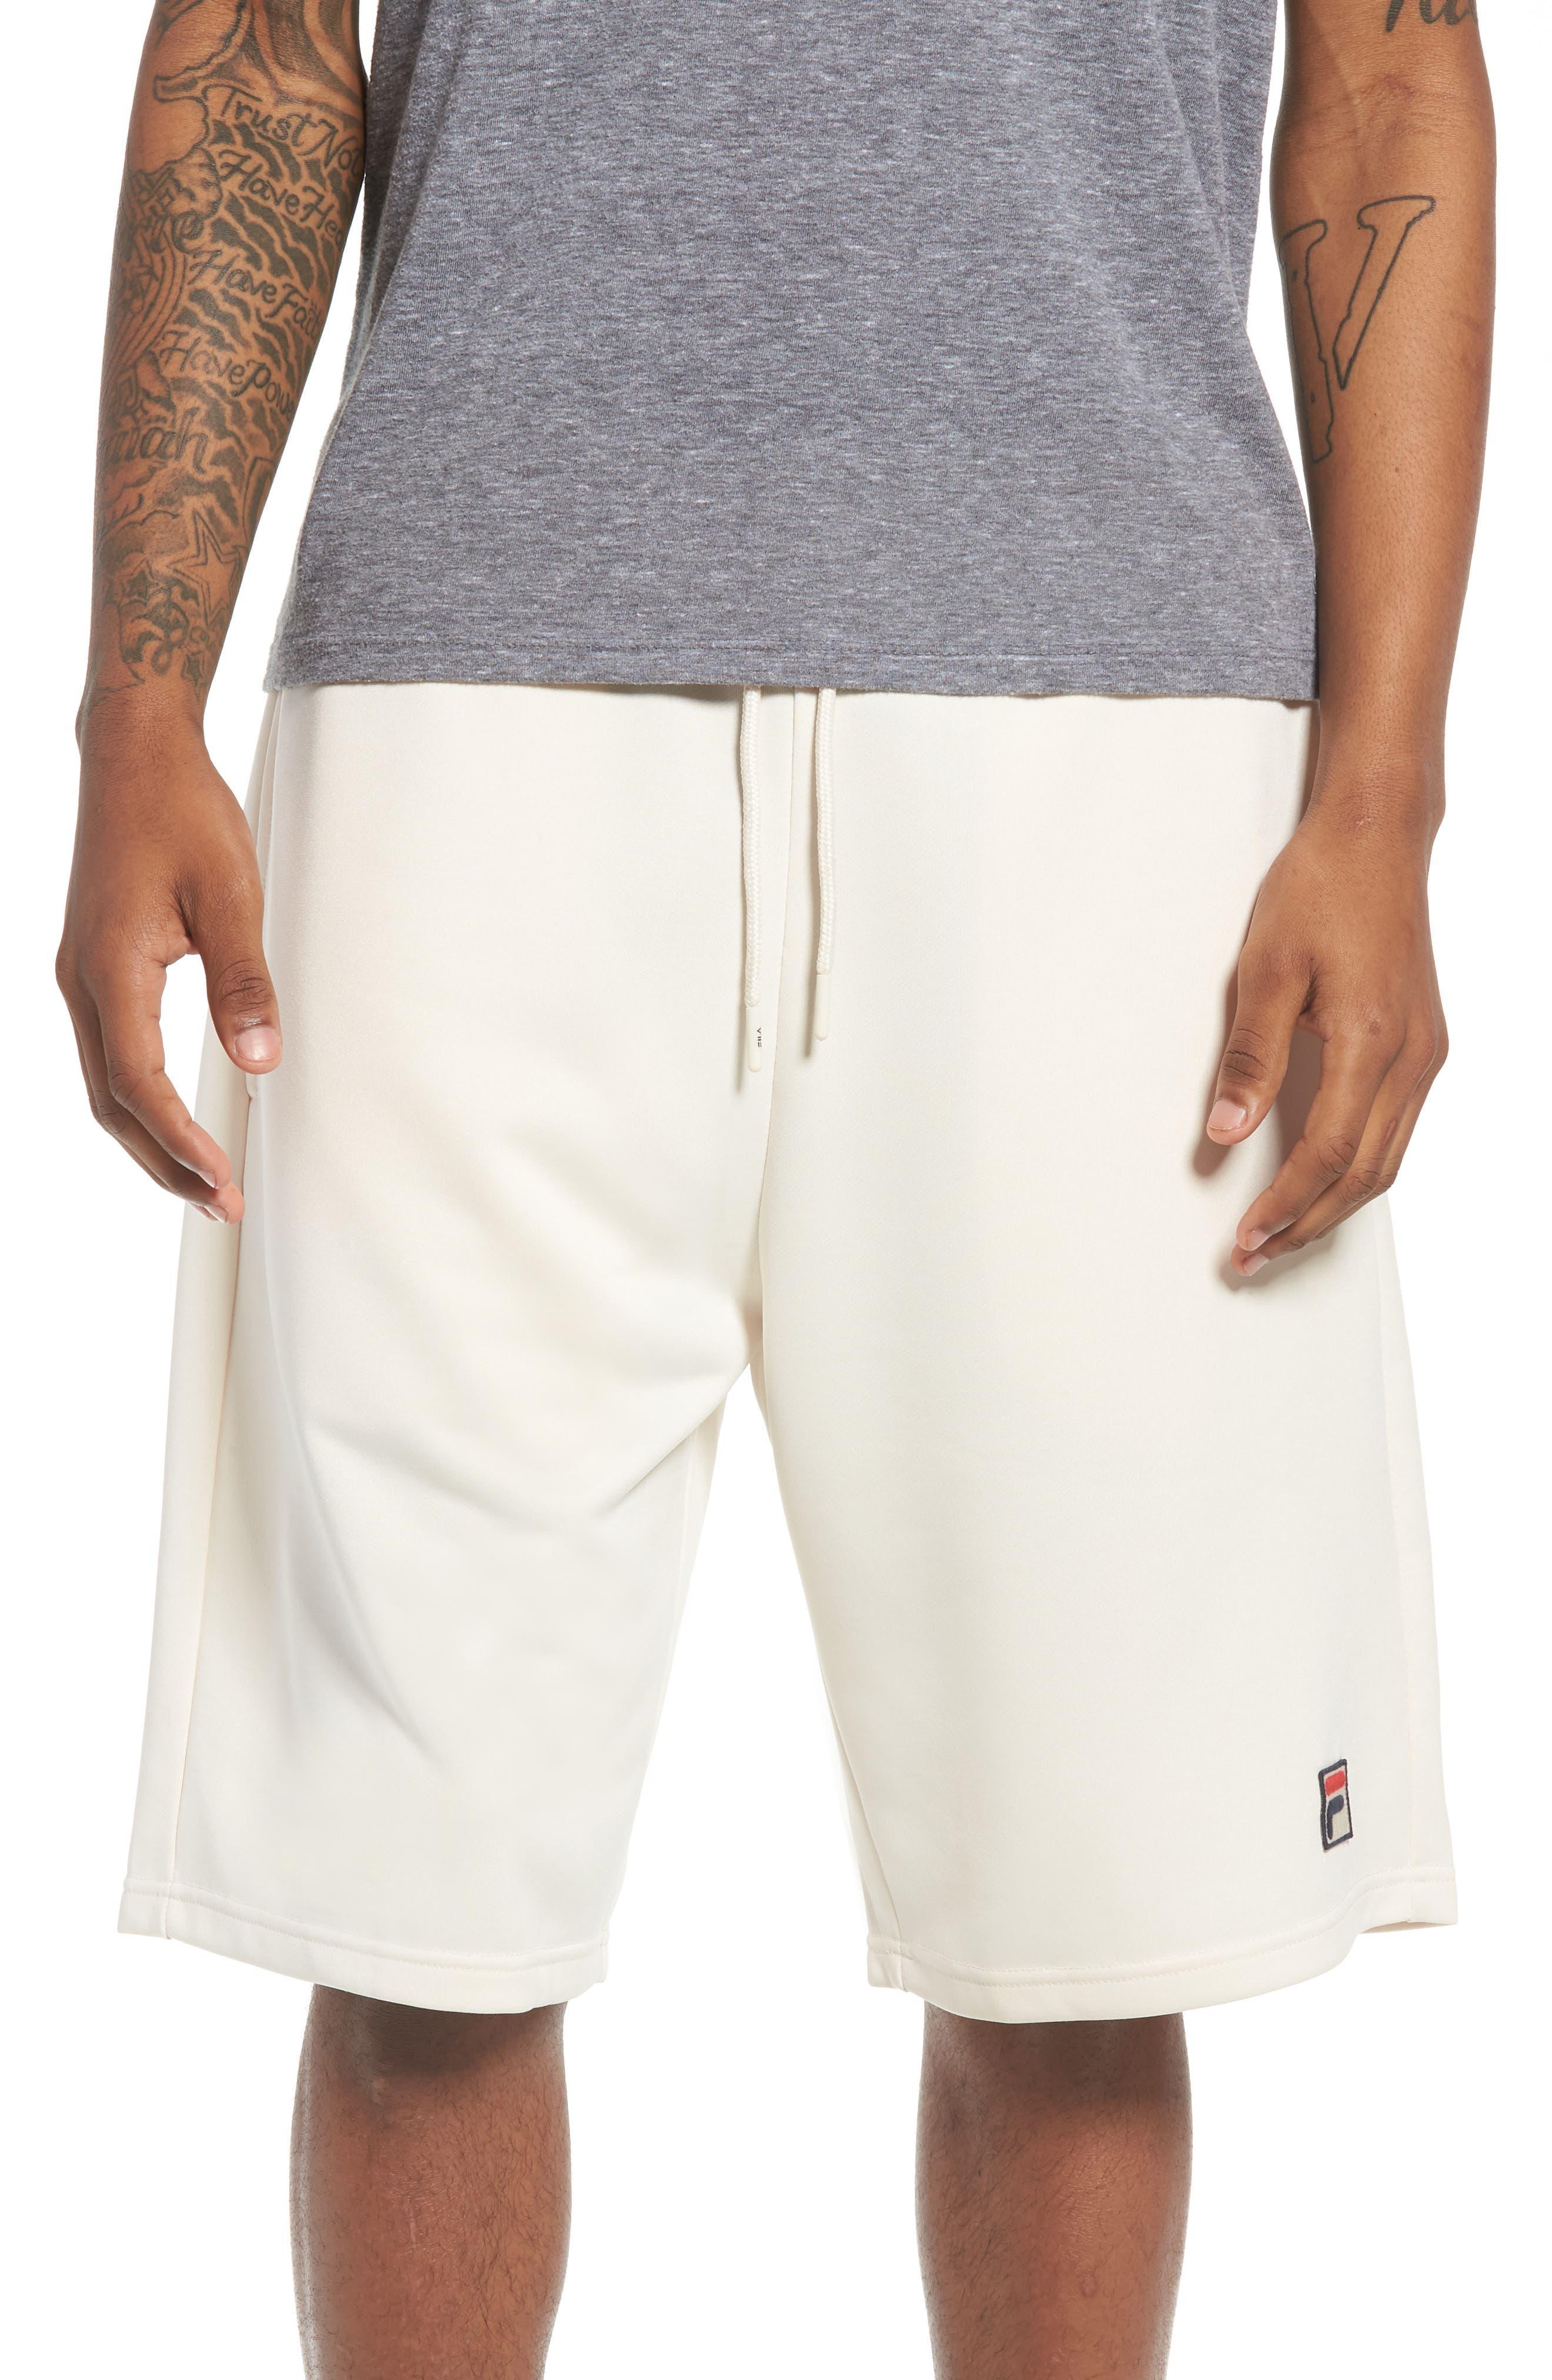 Dominico Shorts,                         Main,                         color, 130